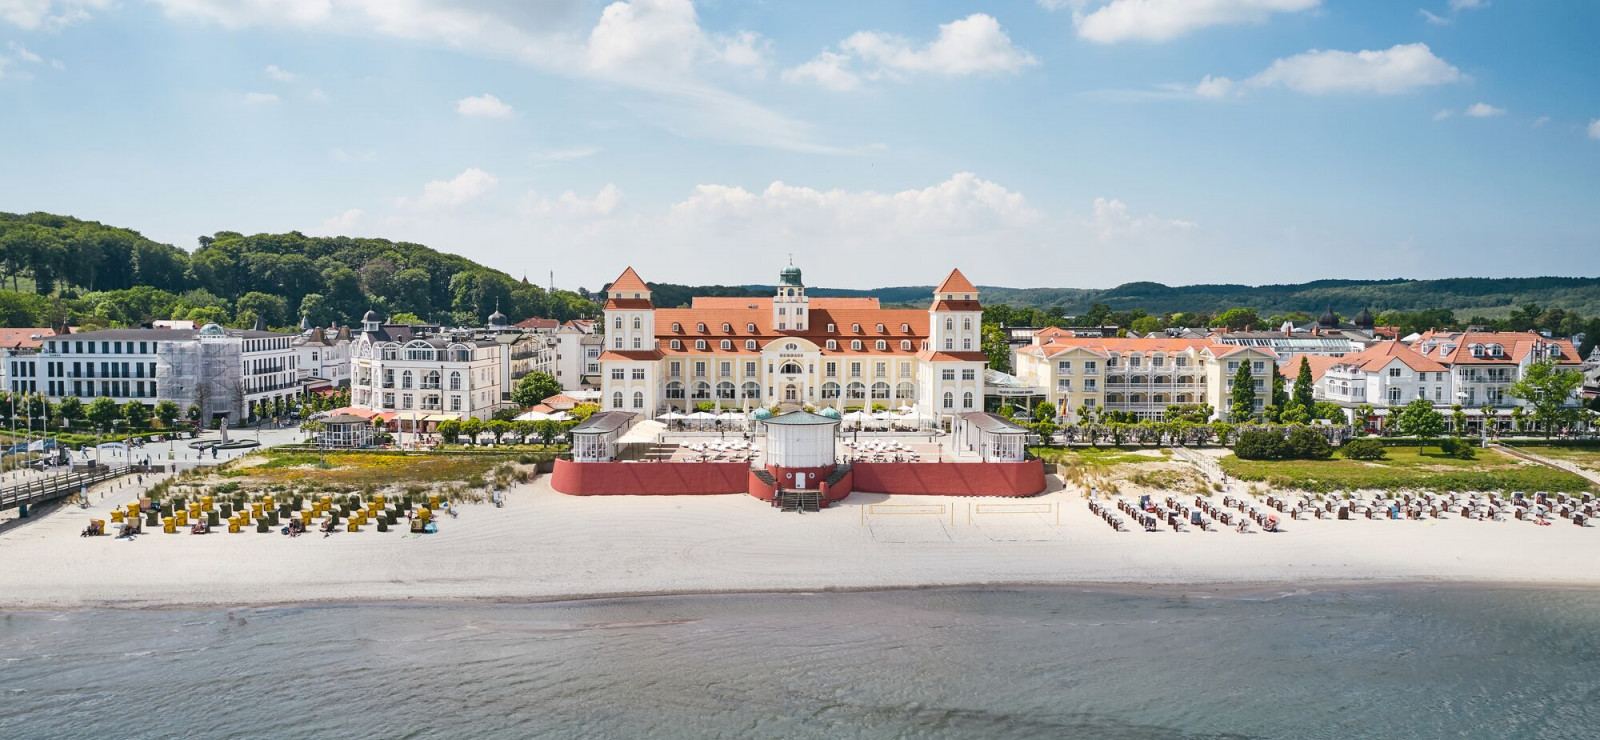 Travel Charme Kurhaus Binz 187 Ostseebad Binz 187 Hotelbewertung